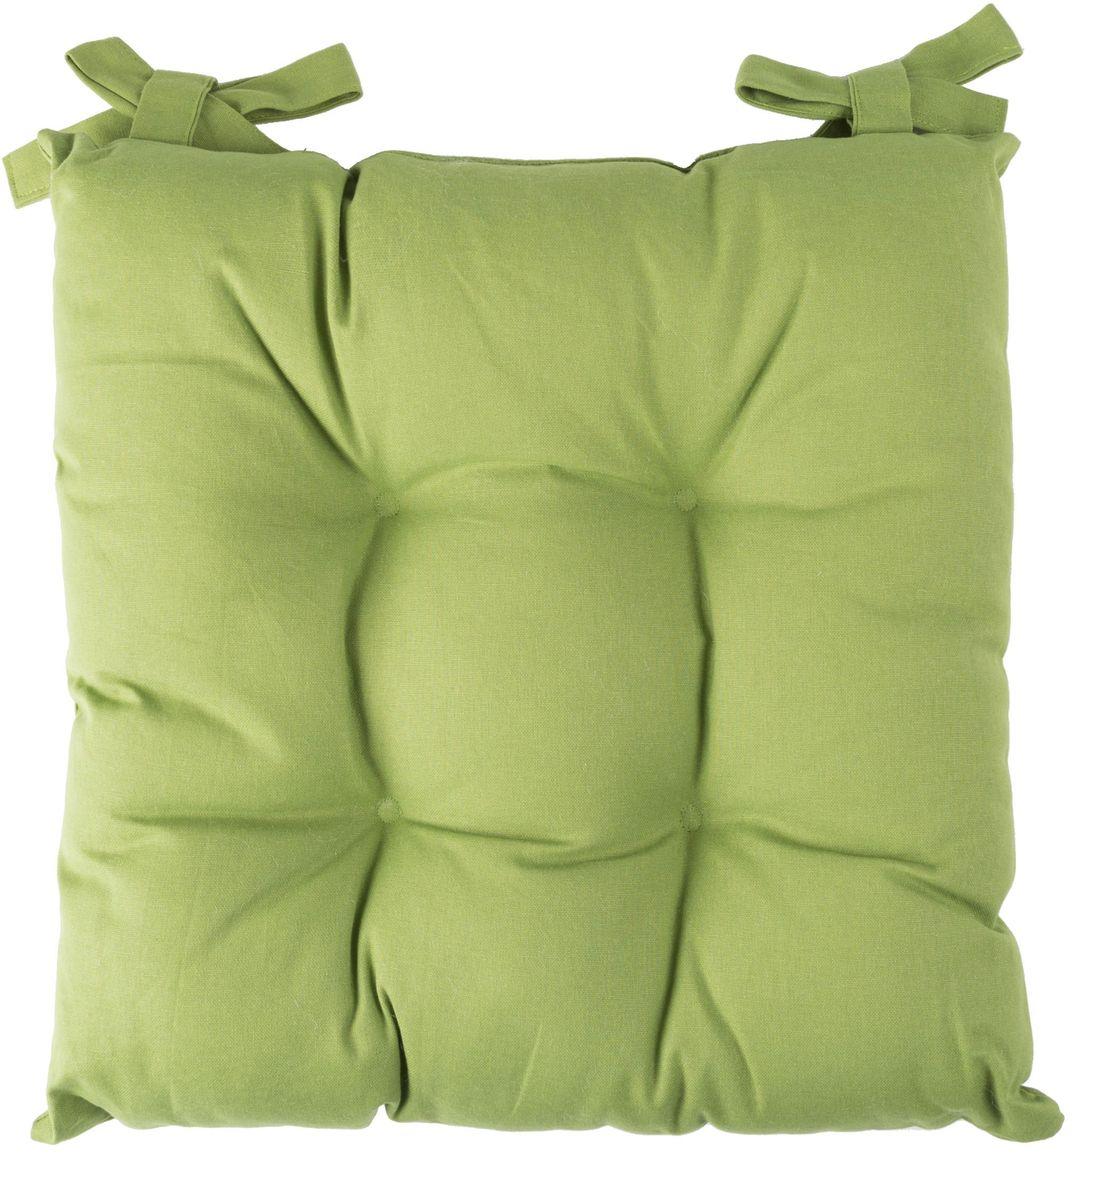 Подушка на стул Daily by Togas Каролина, 45 х 45 см10.01.03.0056КАРОЛИНА Сиденье для стула 45х45, 1 предмет, хлопок.